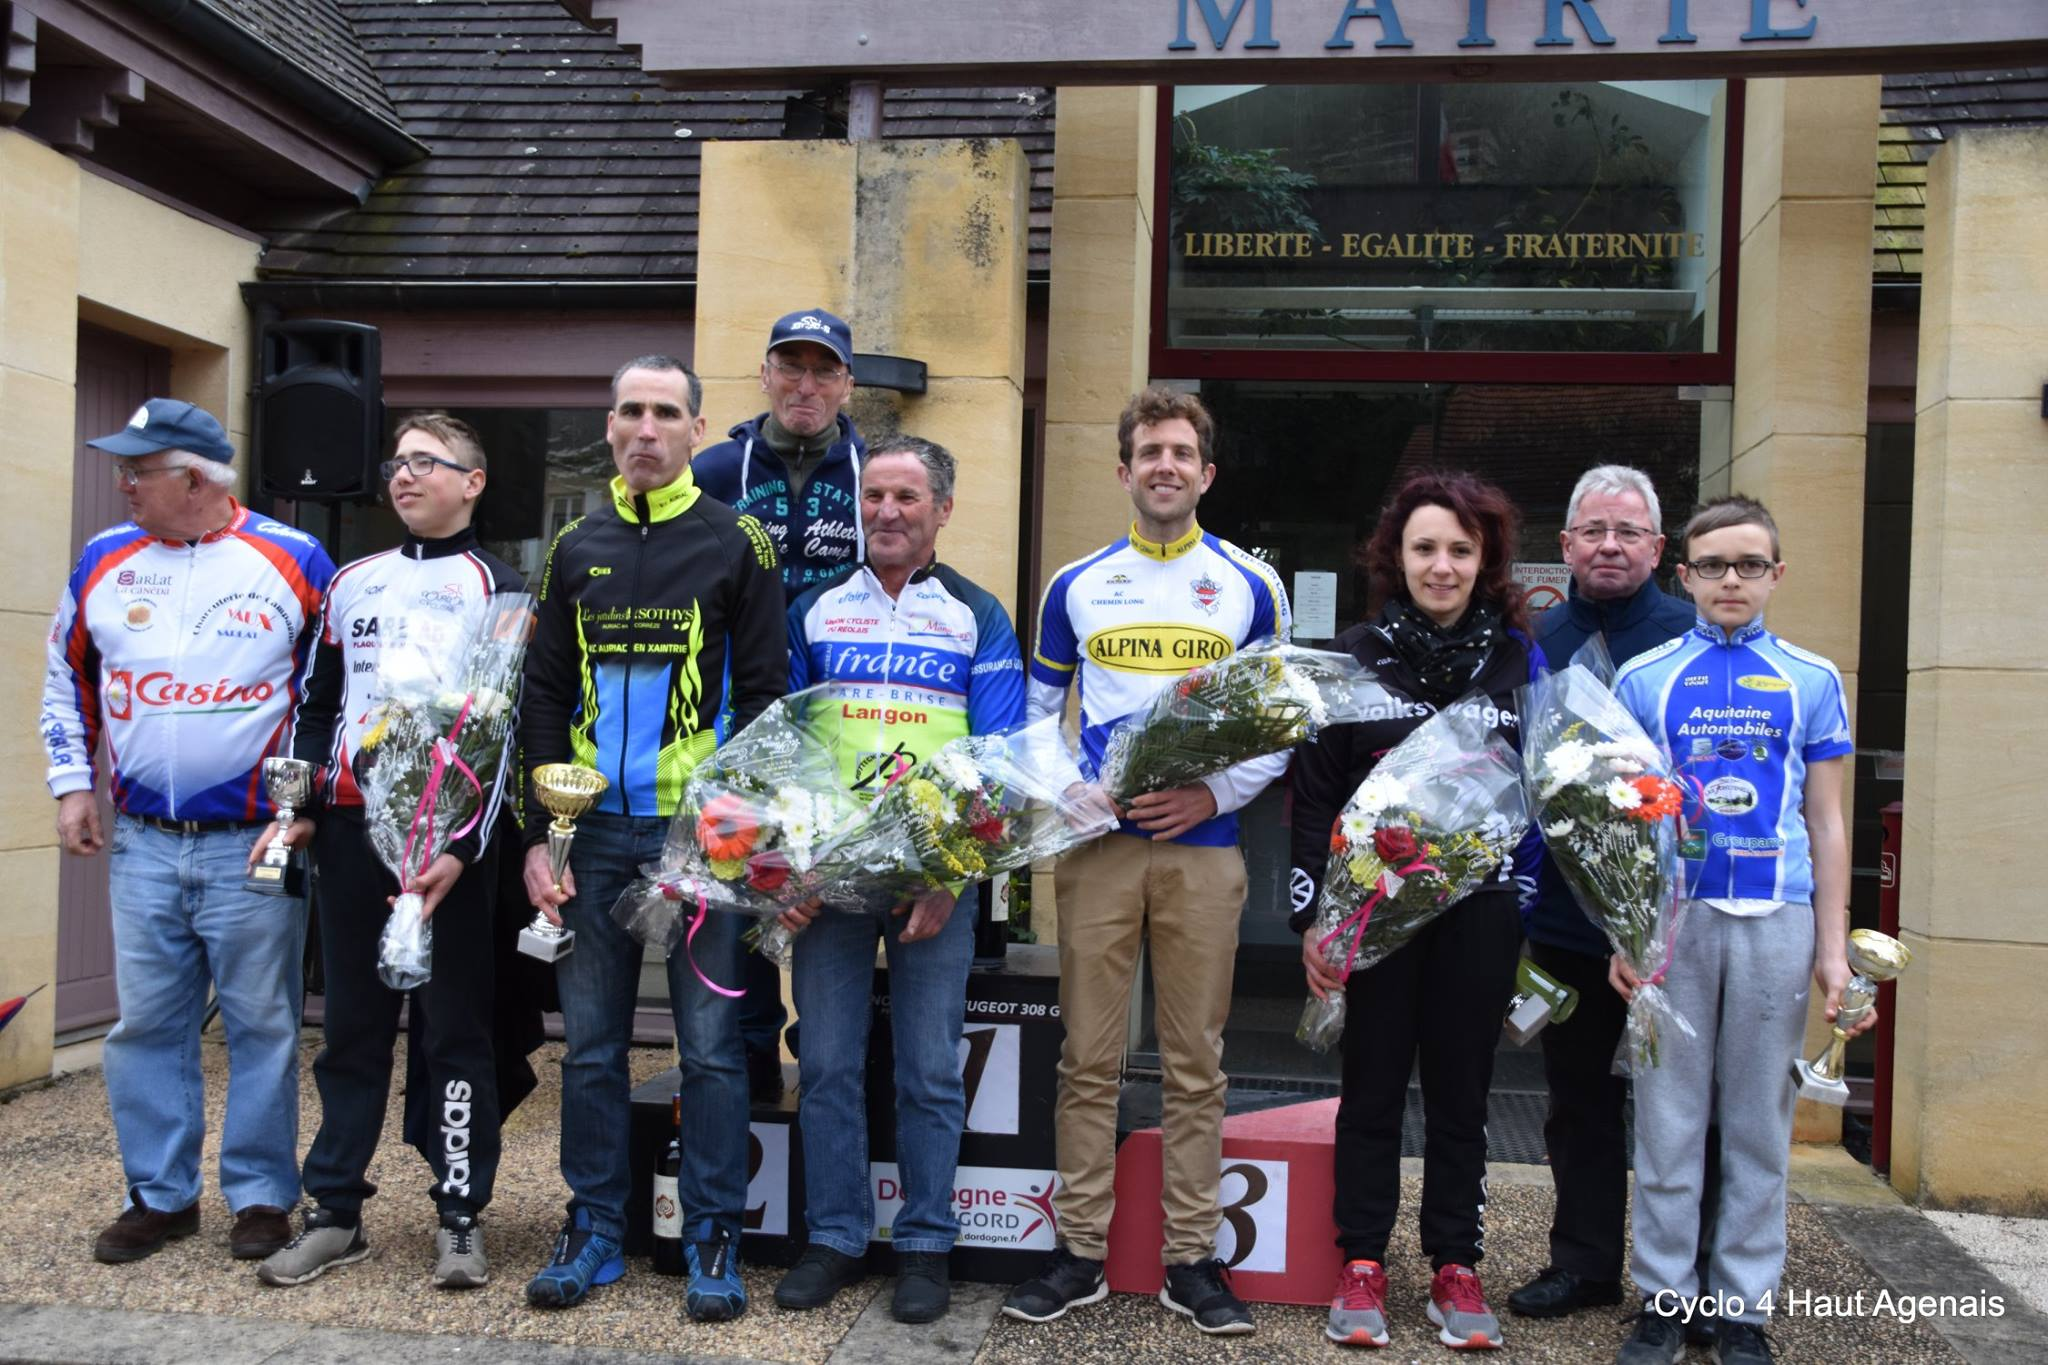 2018-03-25-podium-01.jpg